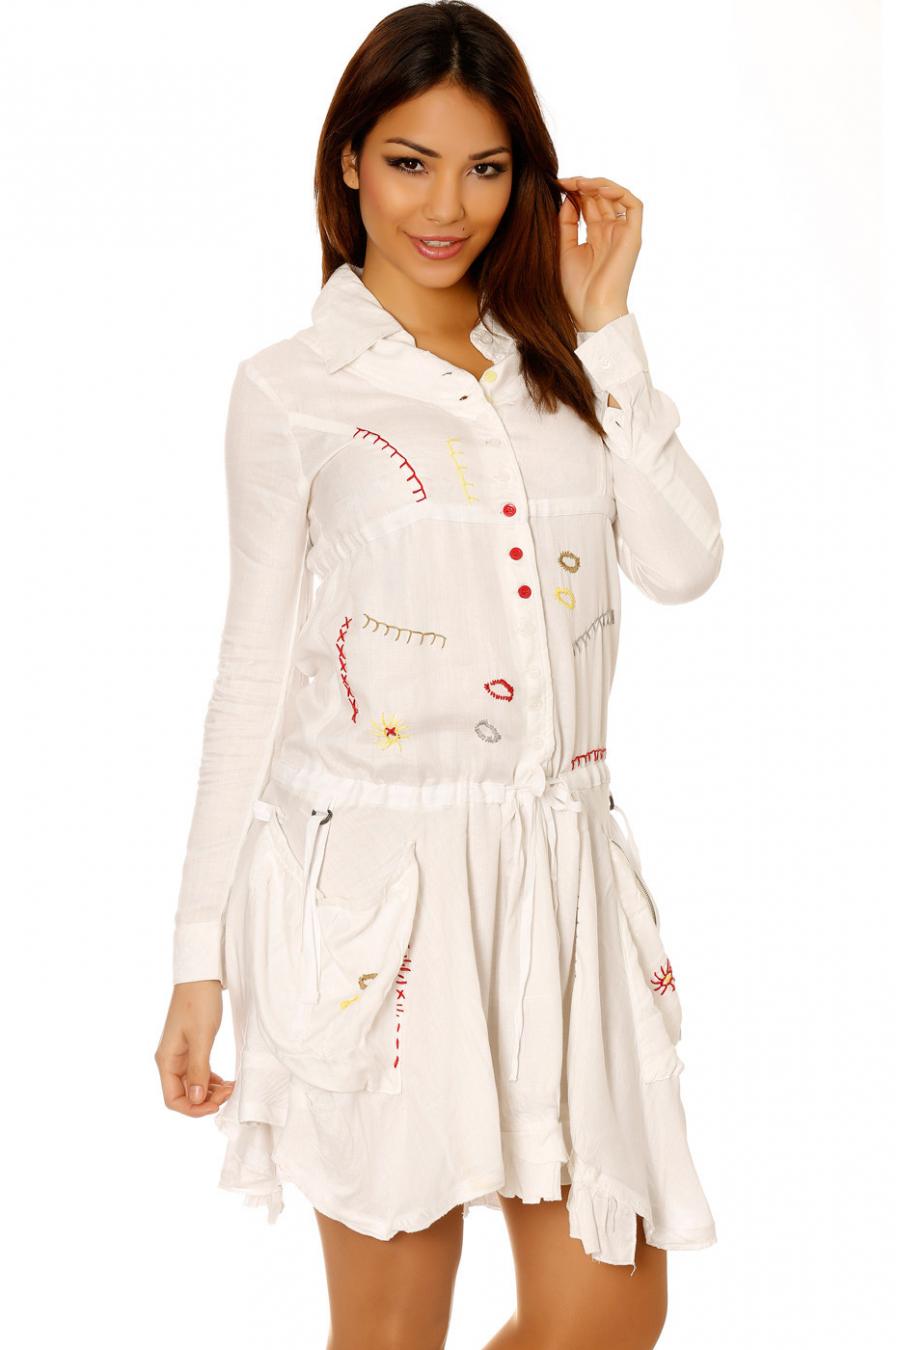 Witte tuniekjurk met knopen en borduursels. Lage prijs dameskleding 921